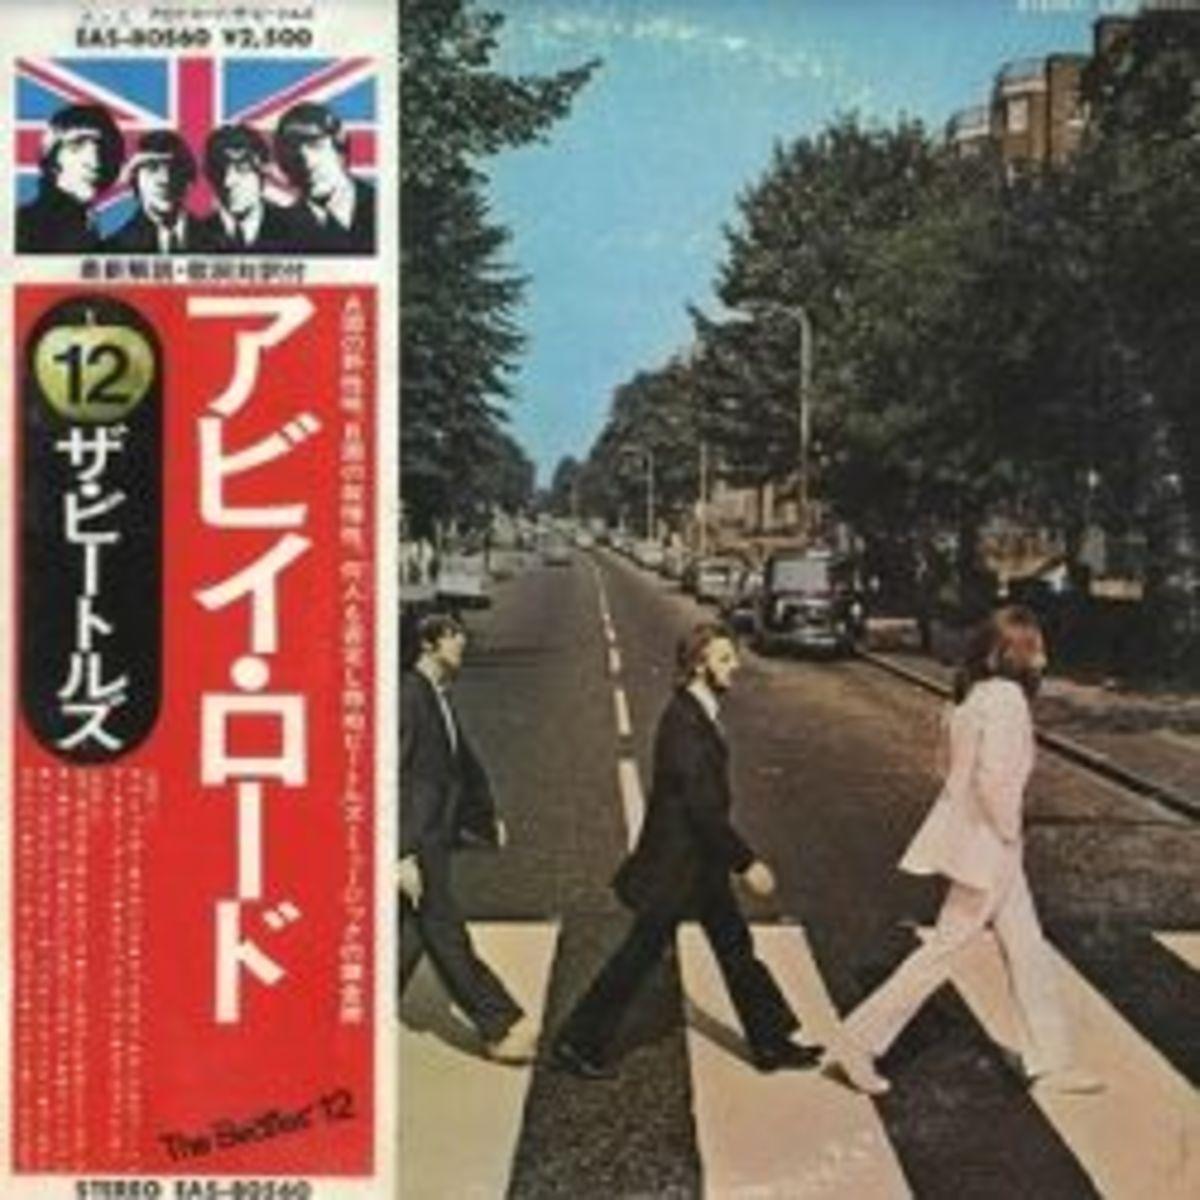 "The Beatles ""Abbey Road"" Apple Records EAS 80560 12"" LP Vinyl Record Japanese  Pressing (1976)"